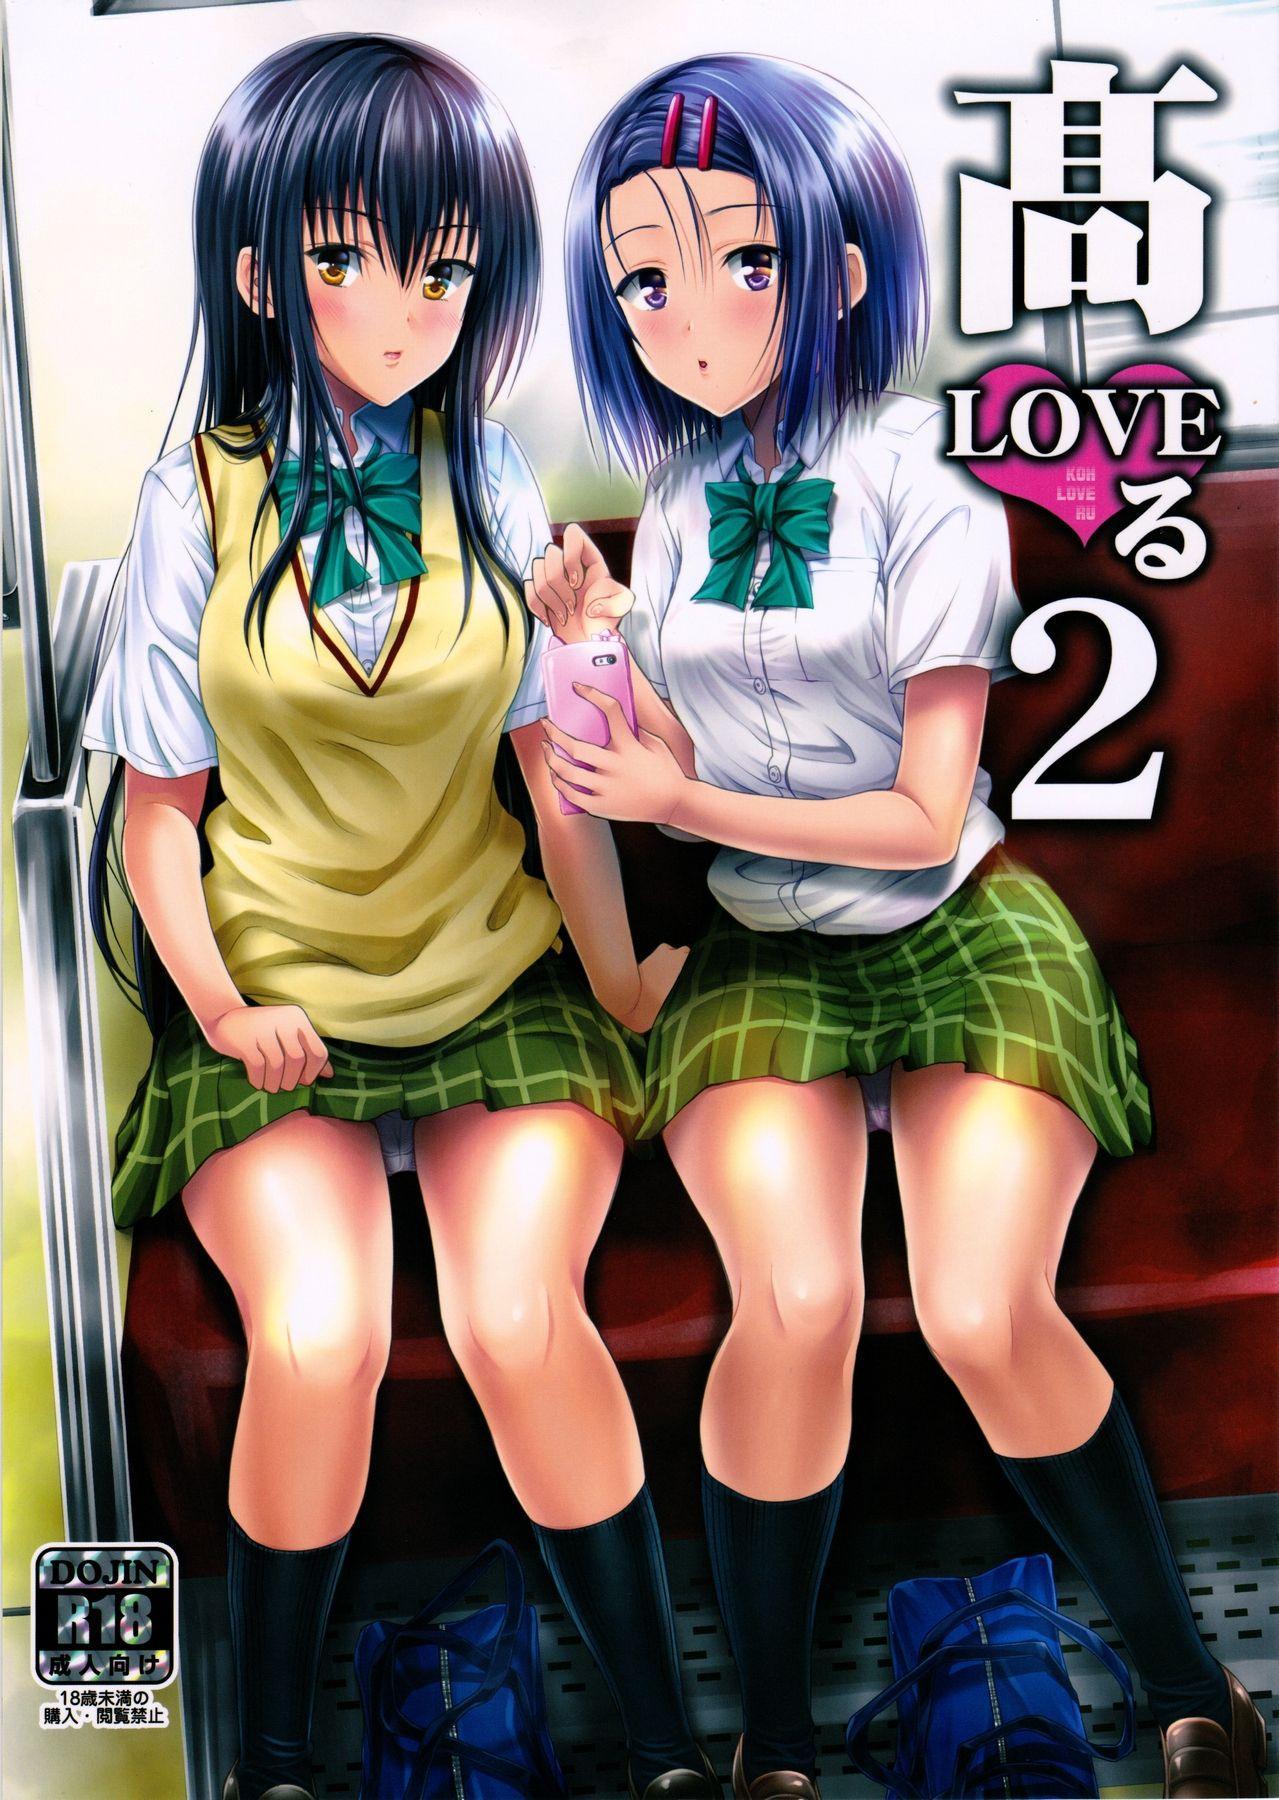 Koh LOVE-Ru 2 0